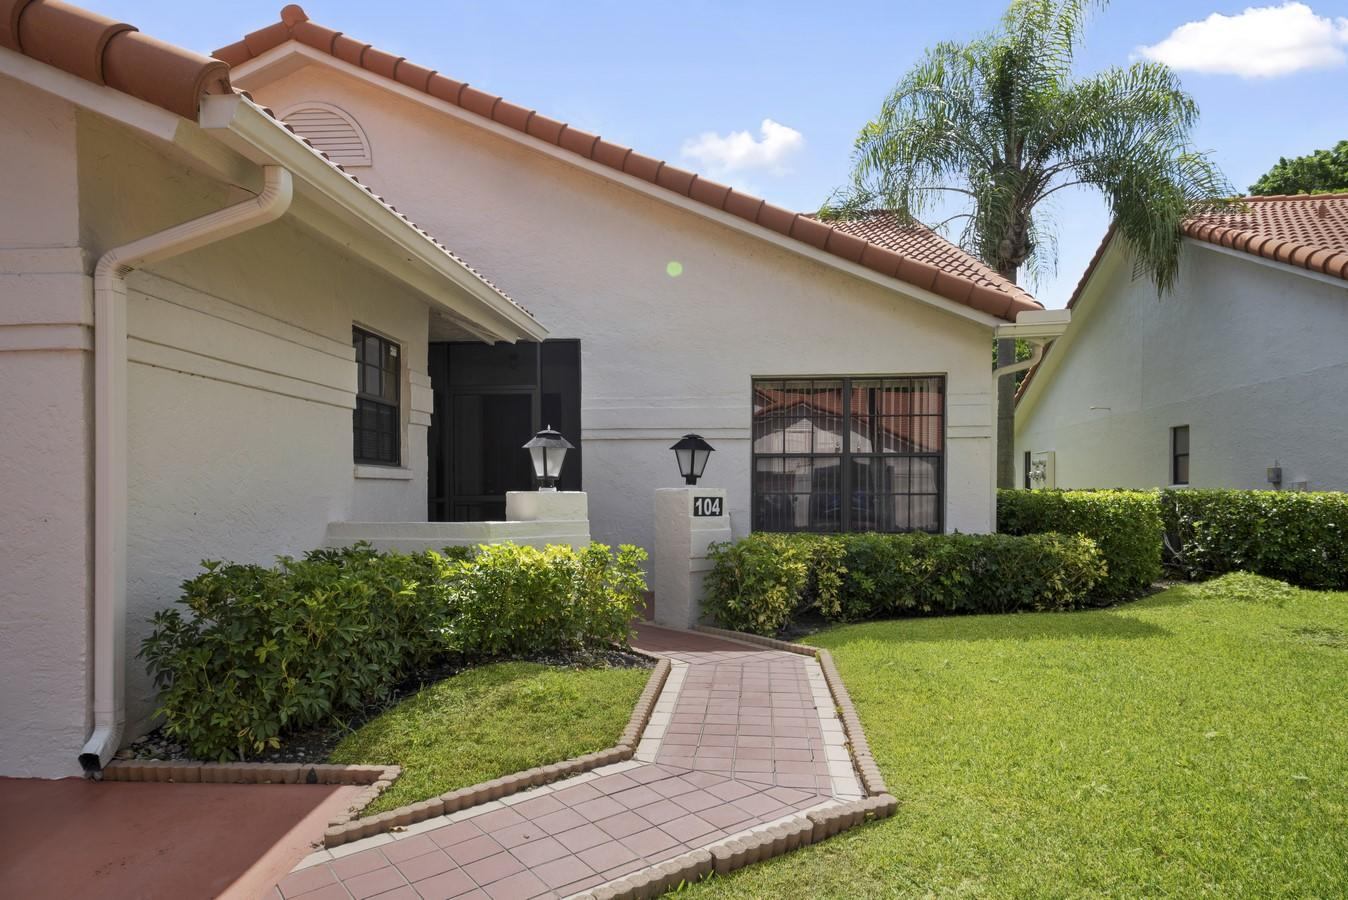 9916 Pavarotti Terrace 104 Boynton Beach, FL 33437 photo 2